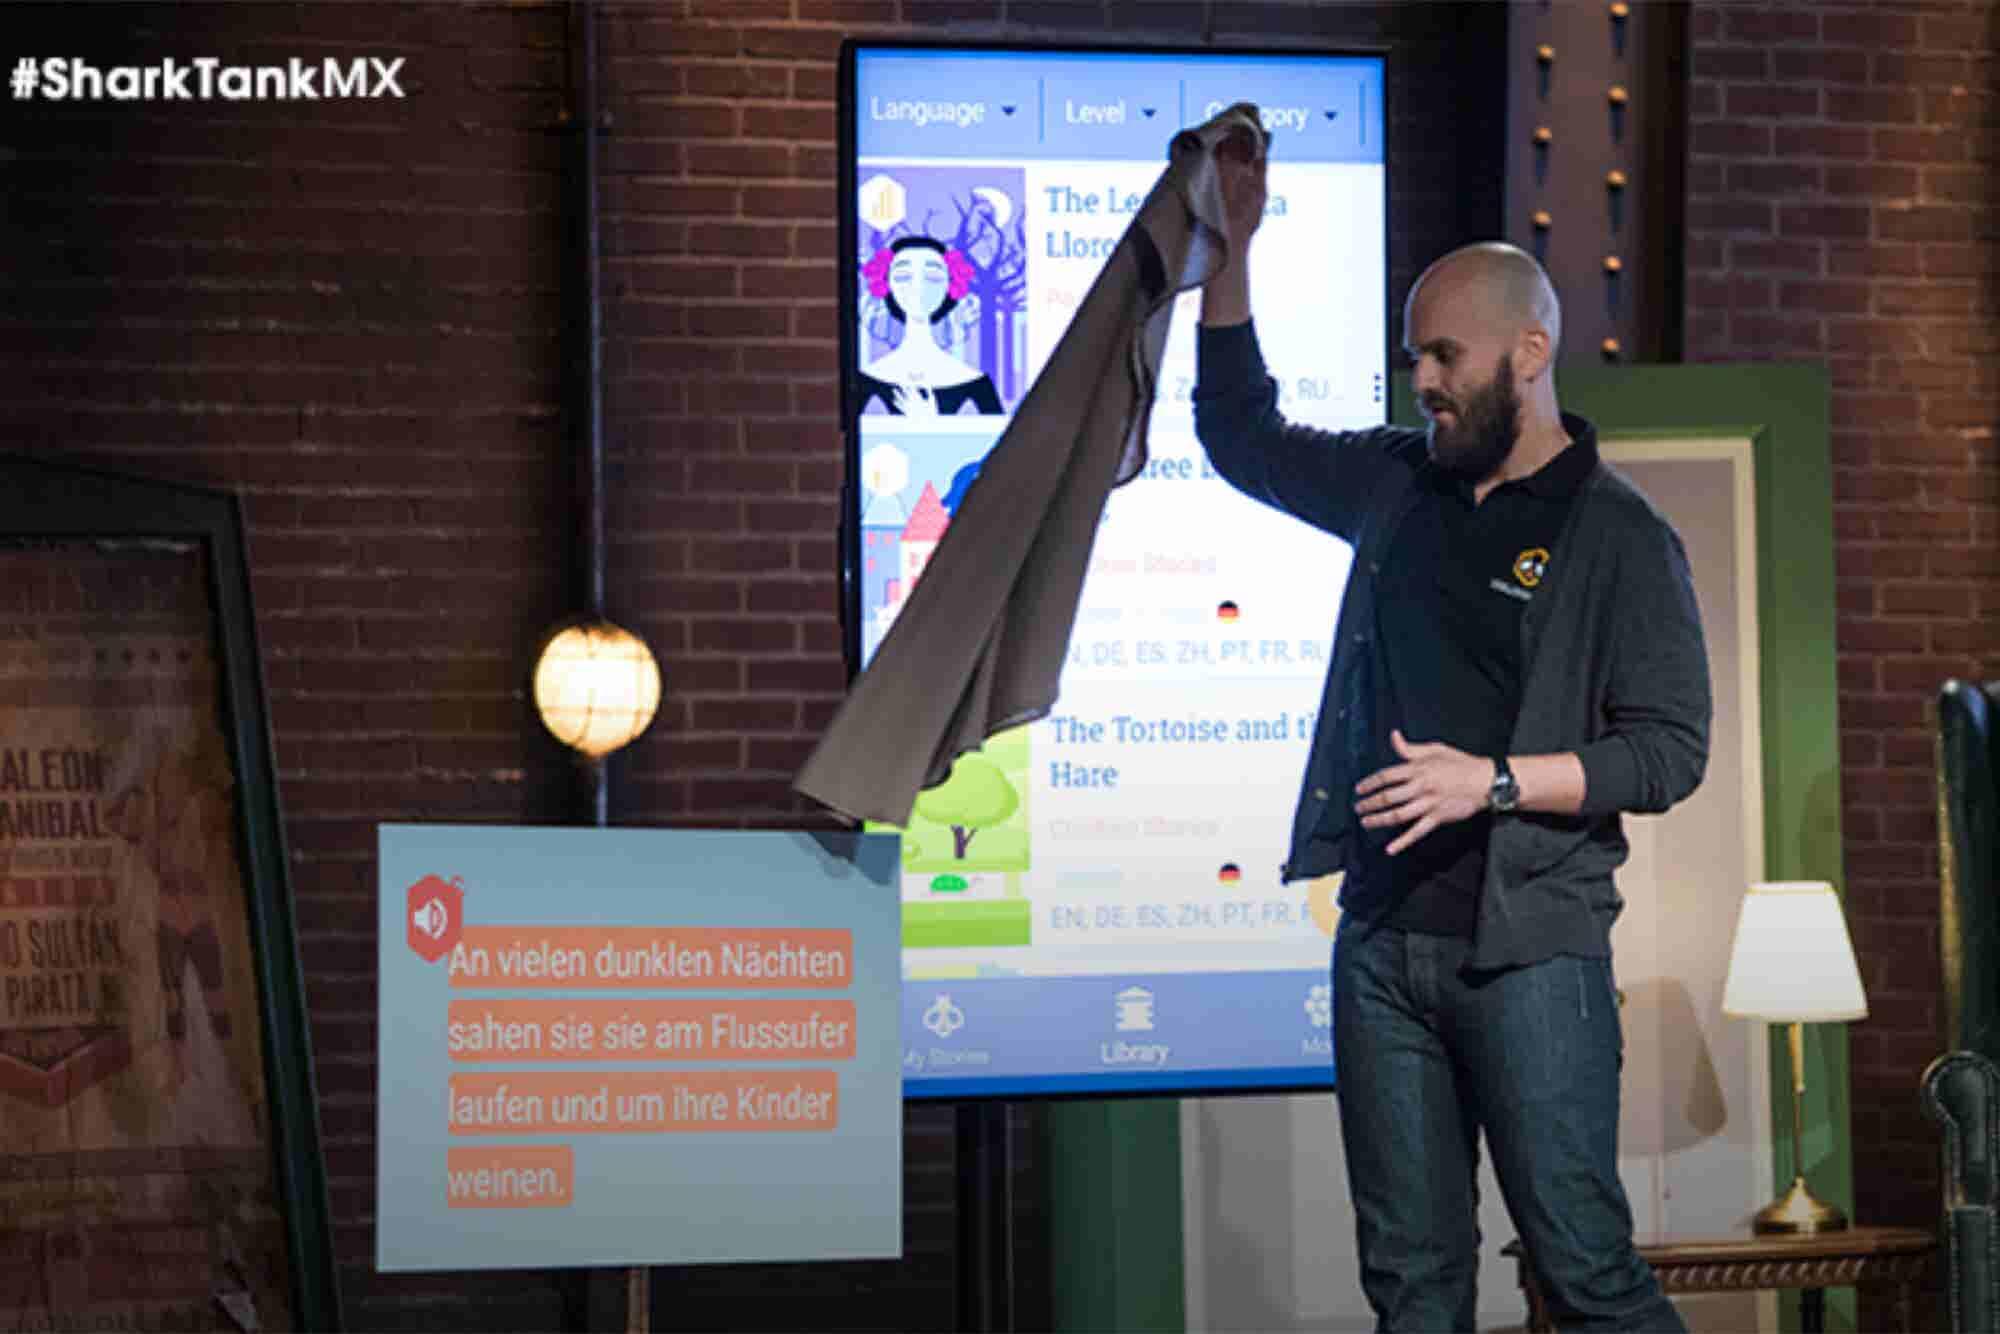 La app para aprender idiomas que consiguió 10 millones de pesos en Sha...